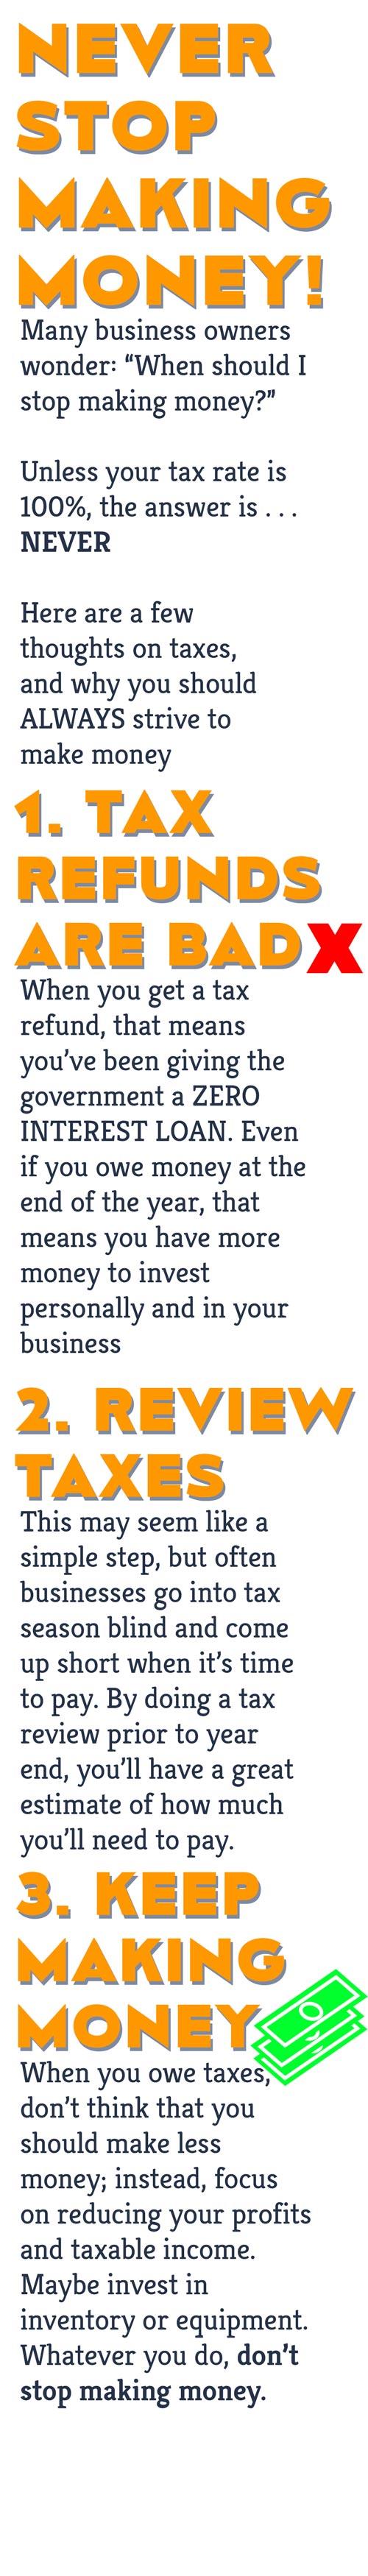 Never-Stop-Making-Money-Recovered.jpg